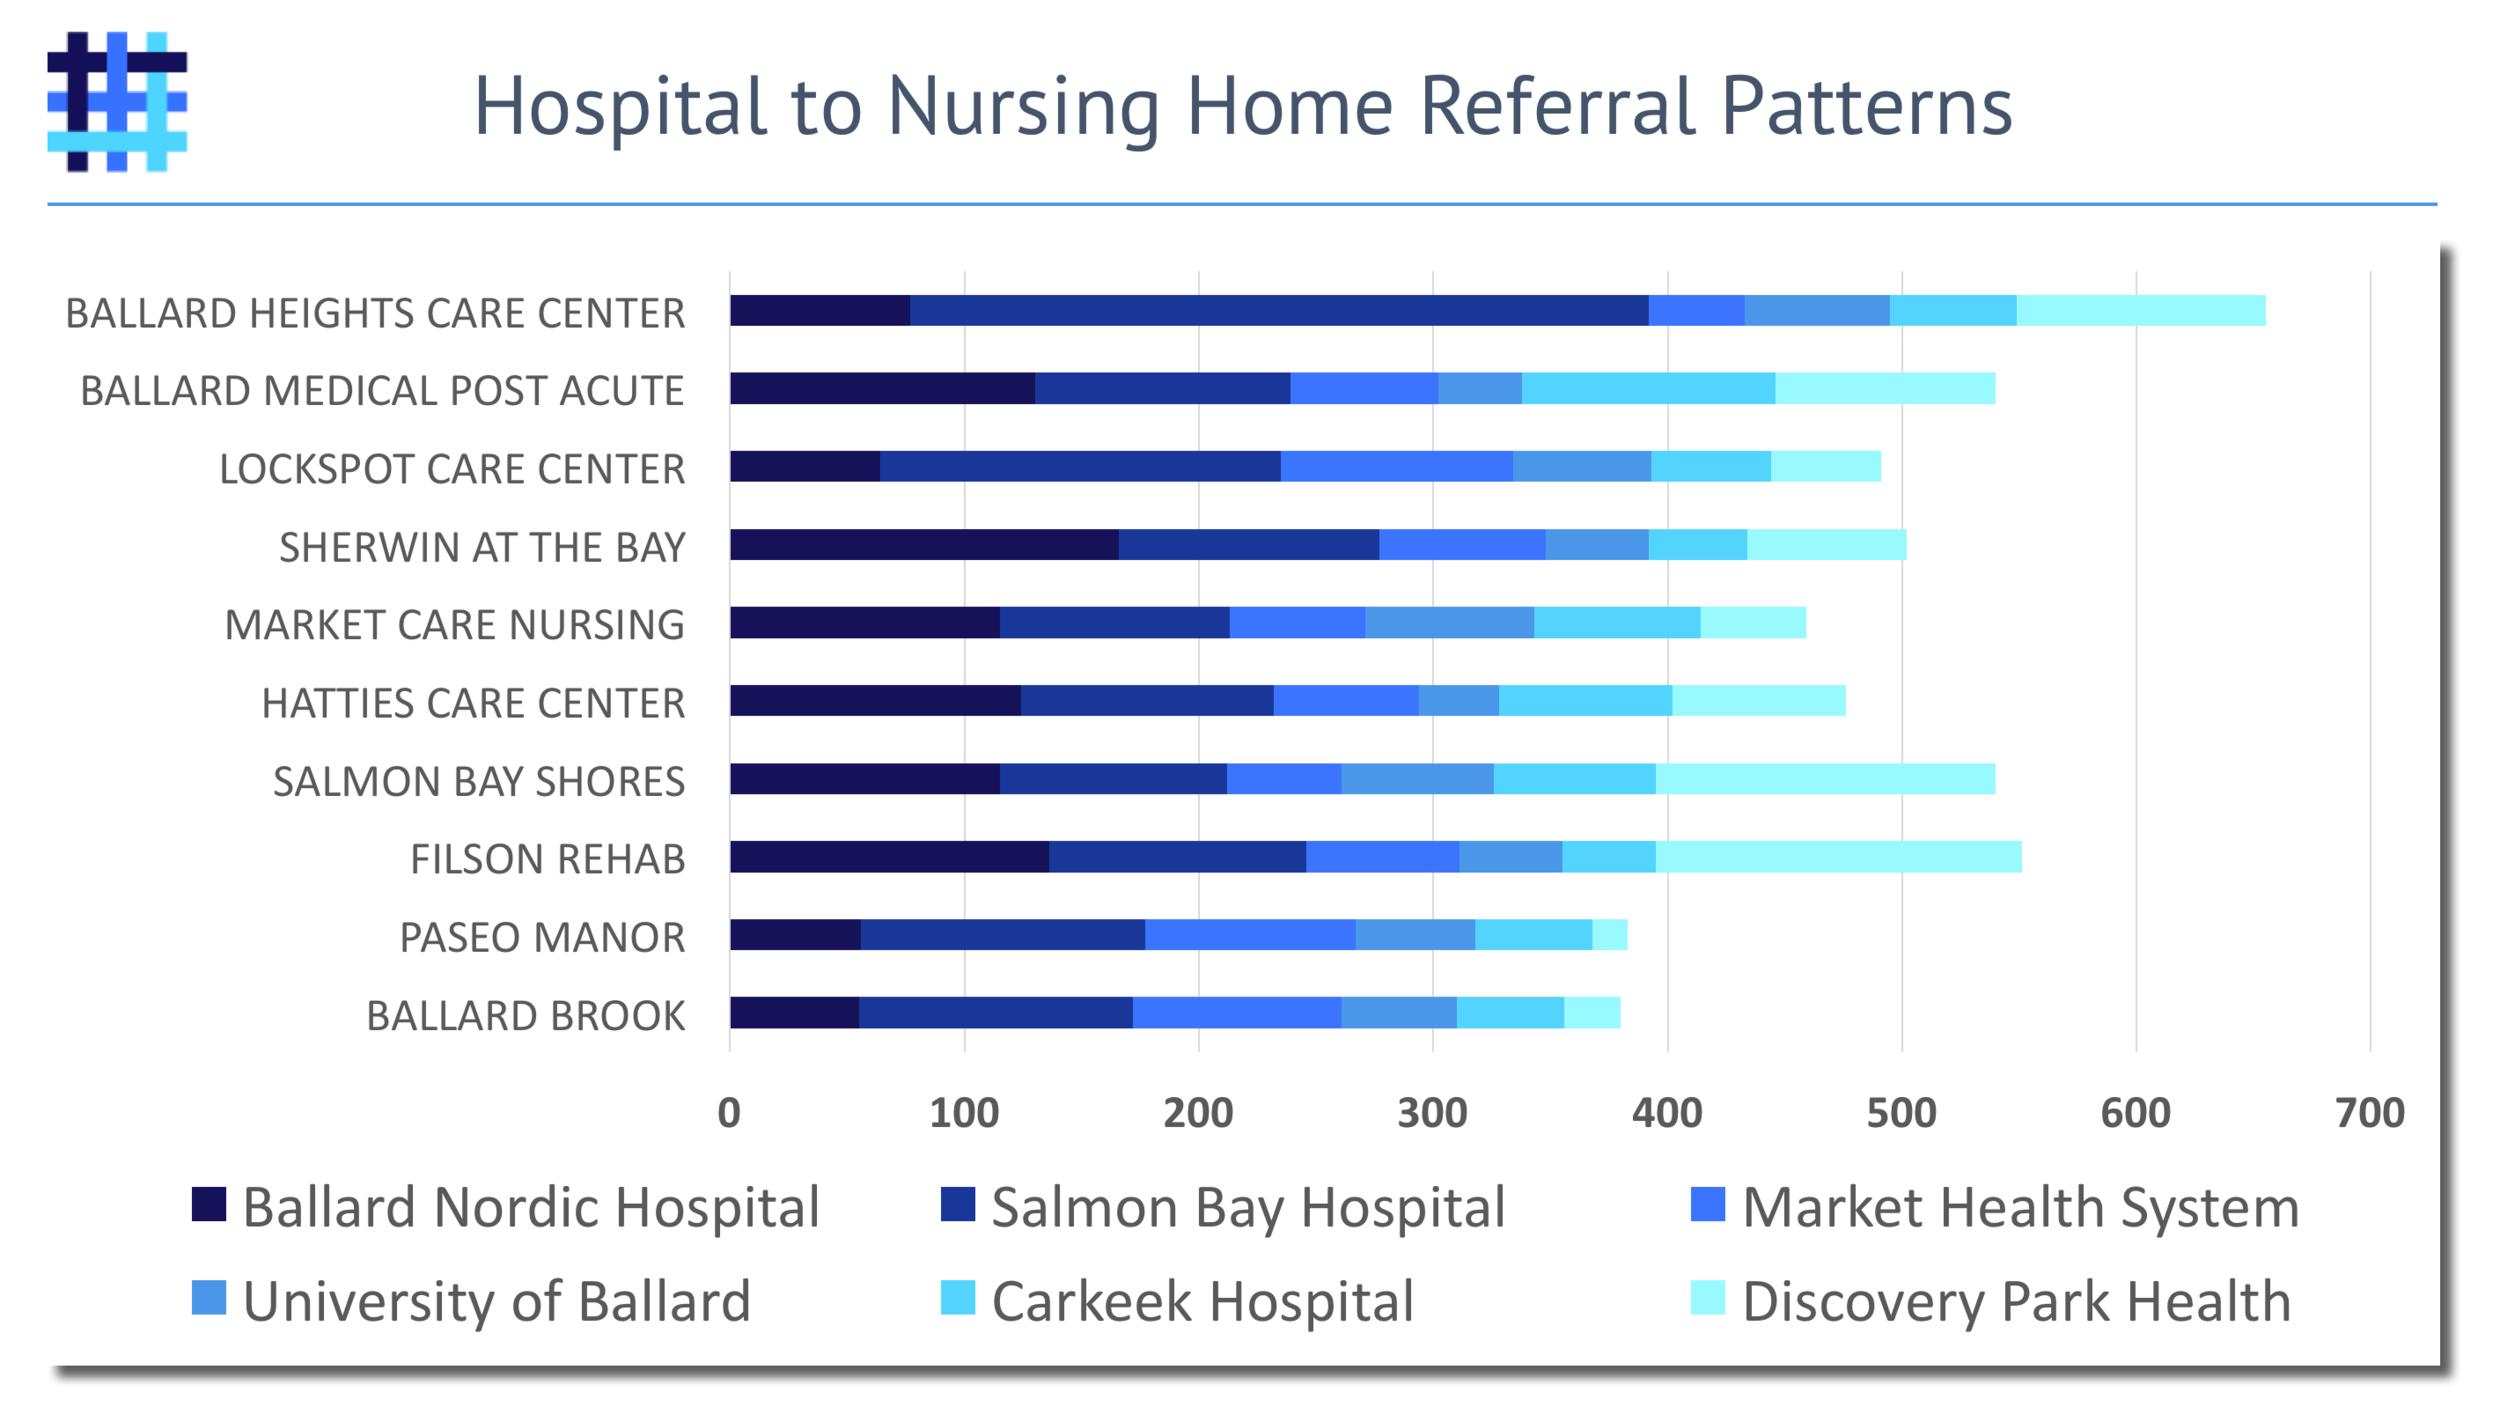 Hospital to Nursing Home Referral Patterns MSPB